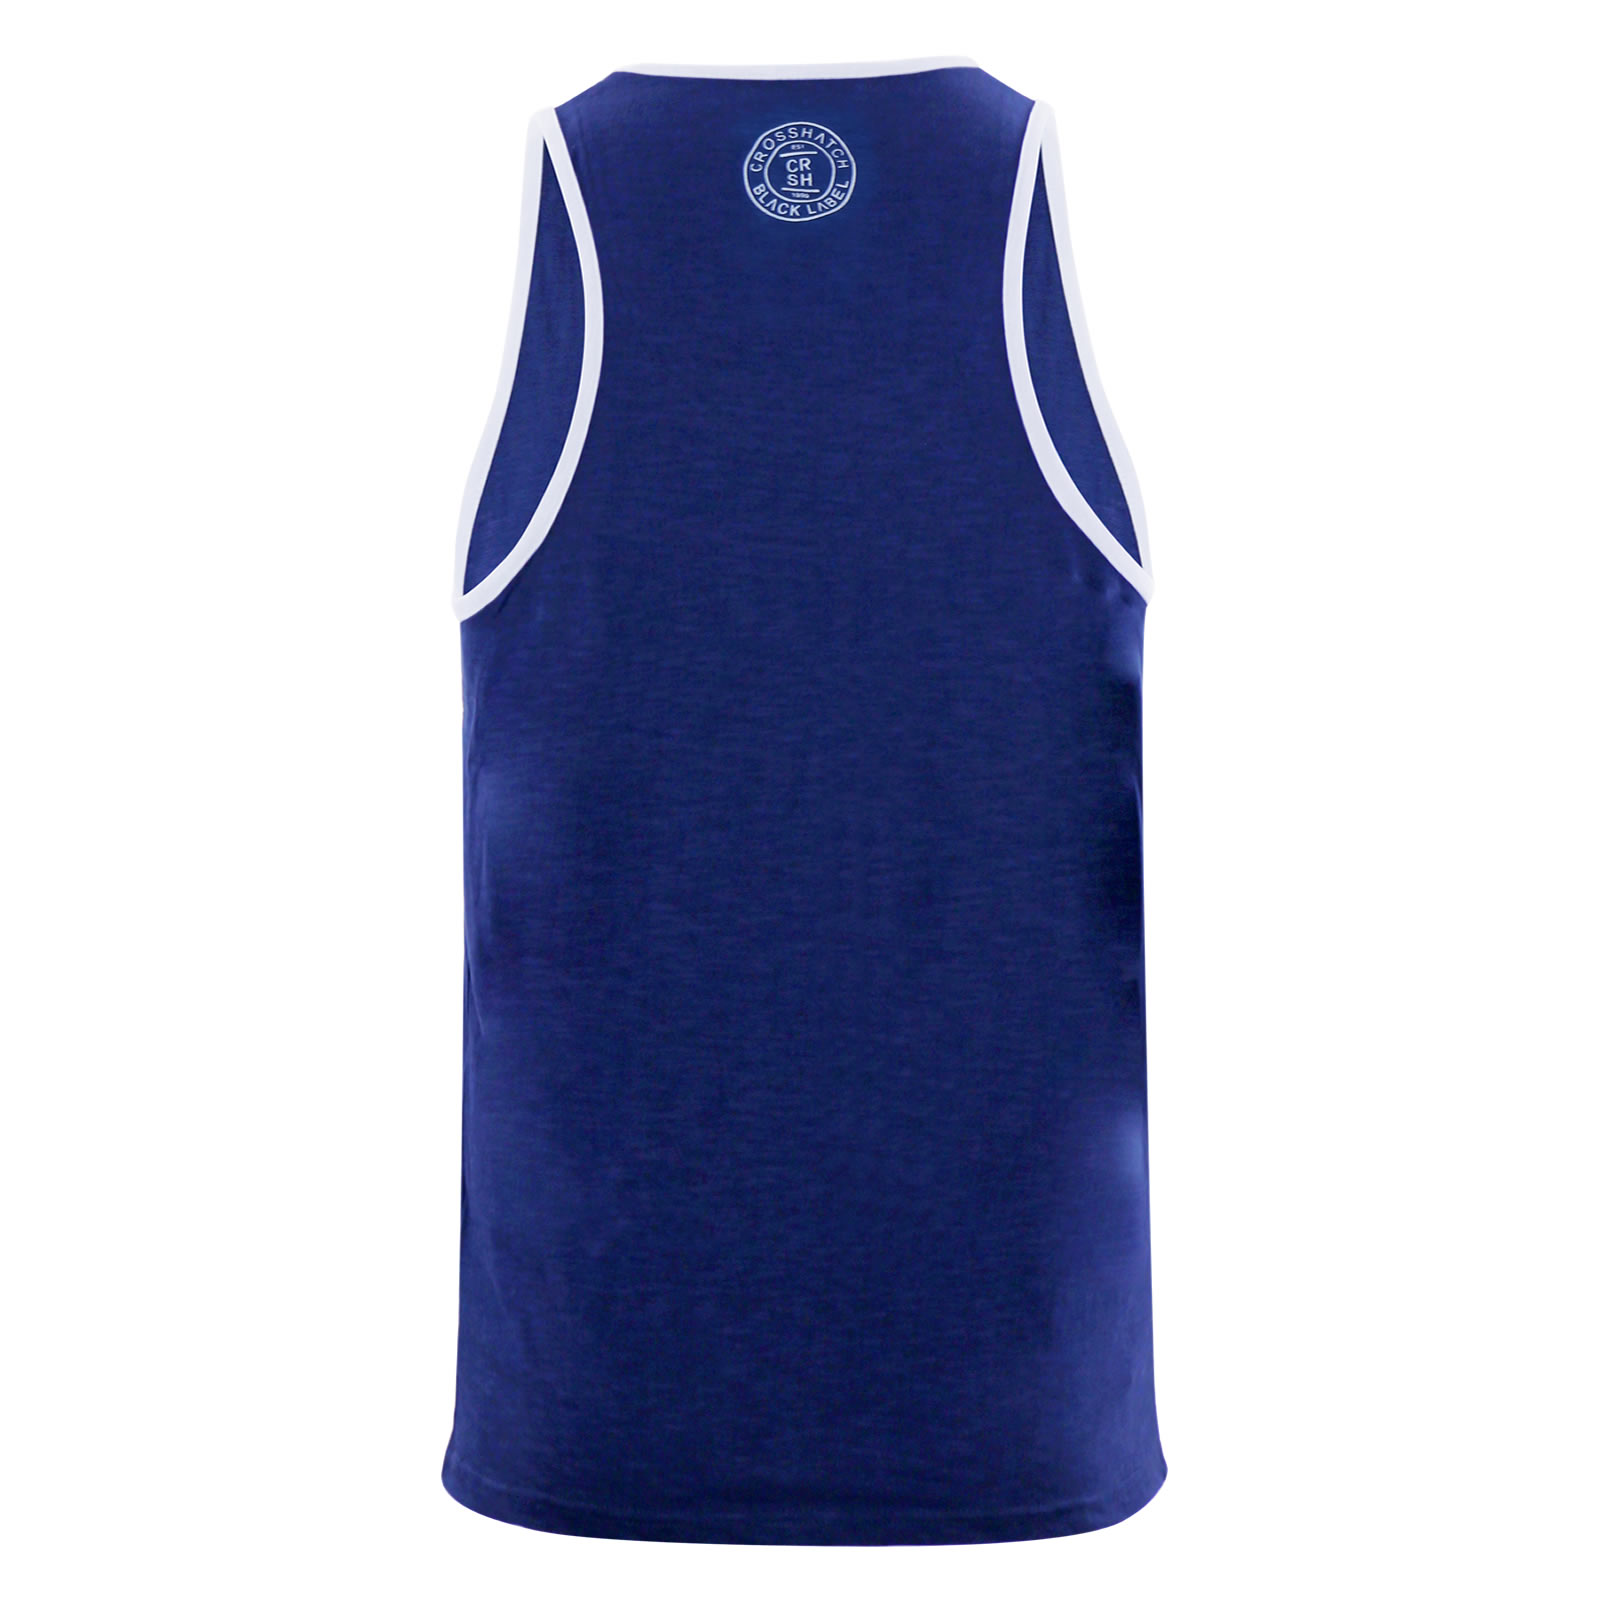 miniature 6 - Homme-debardeur-t-shirt-crosshatch-alfa-summer-muscle-back-tank-top